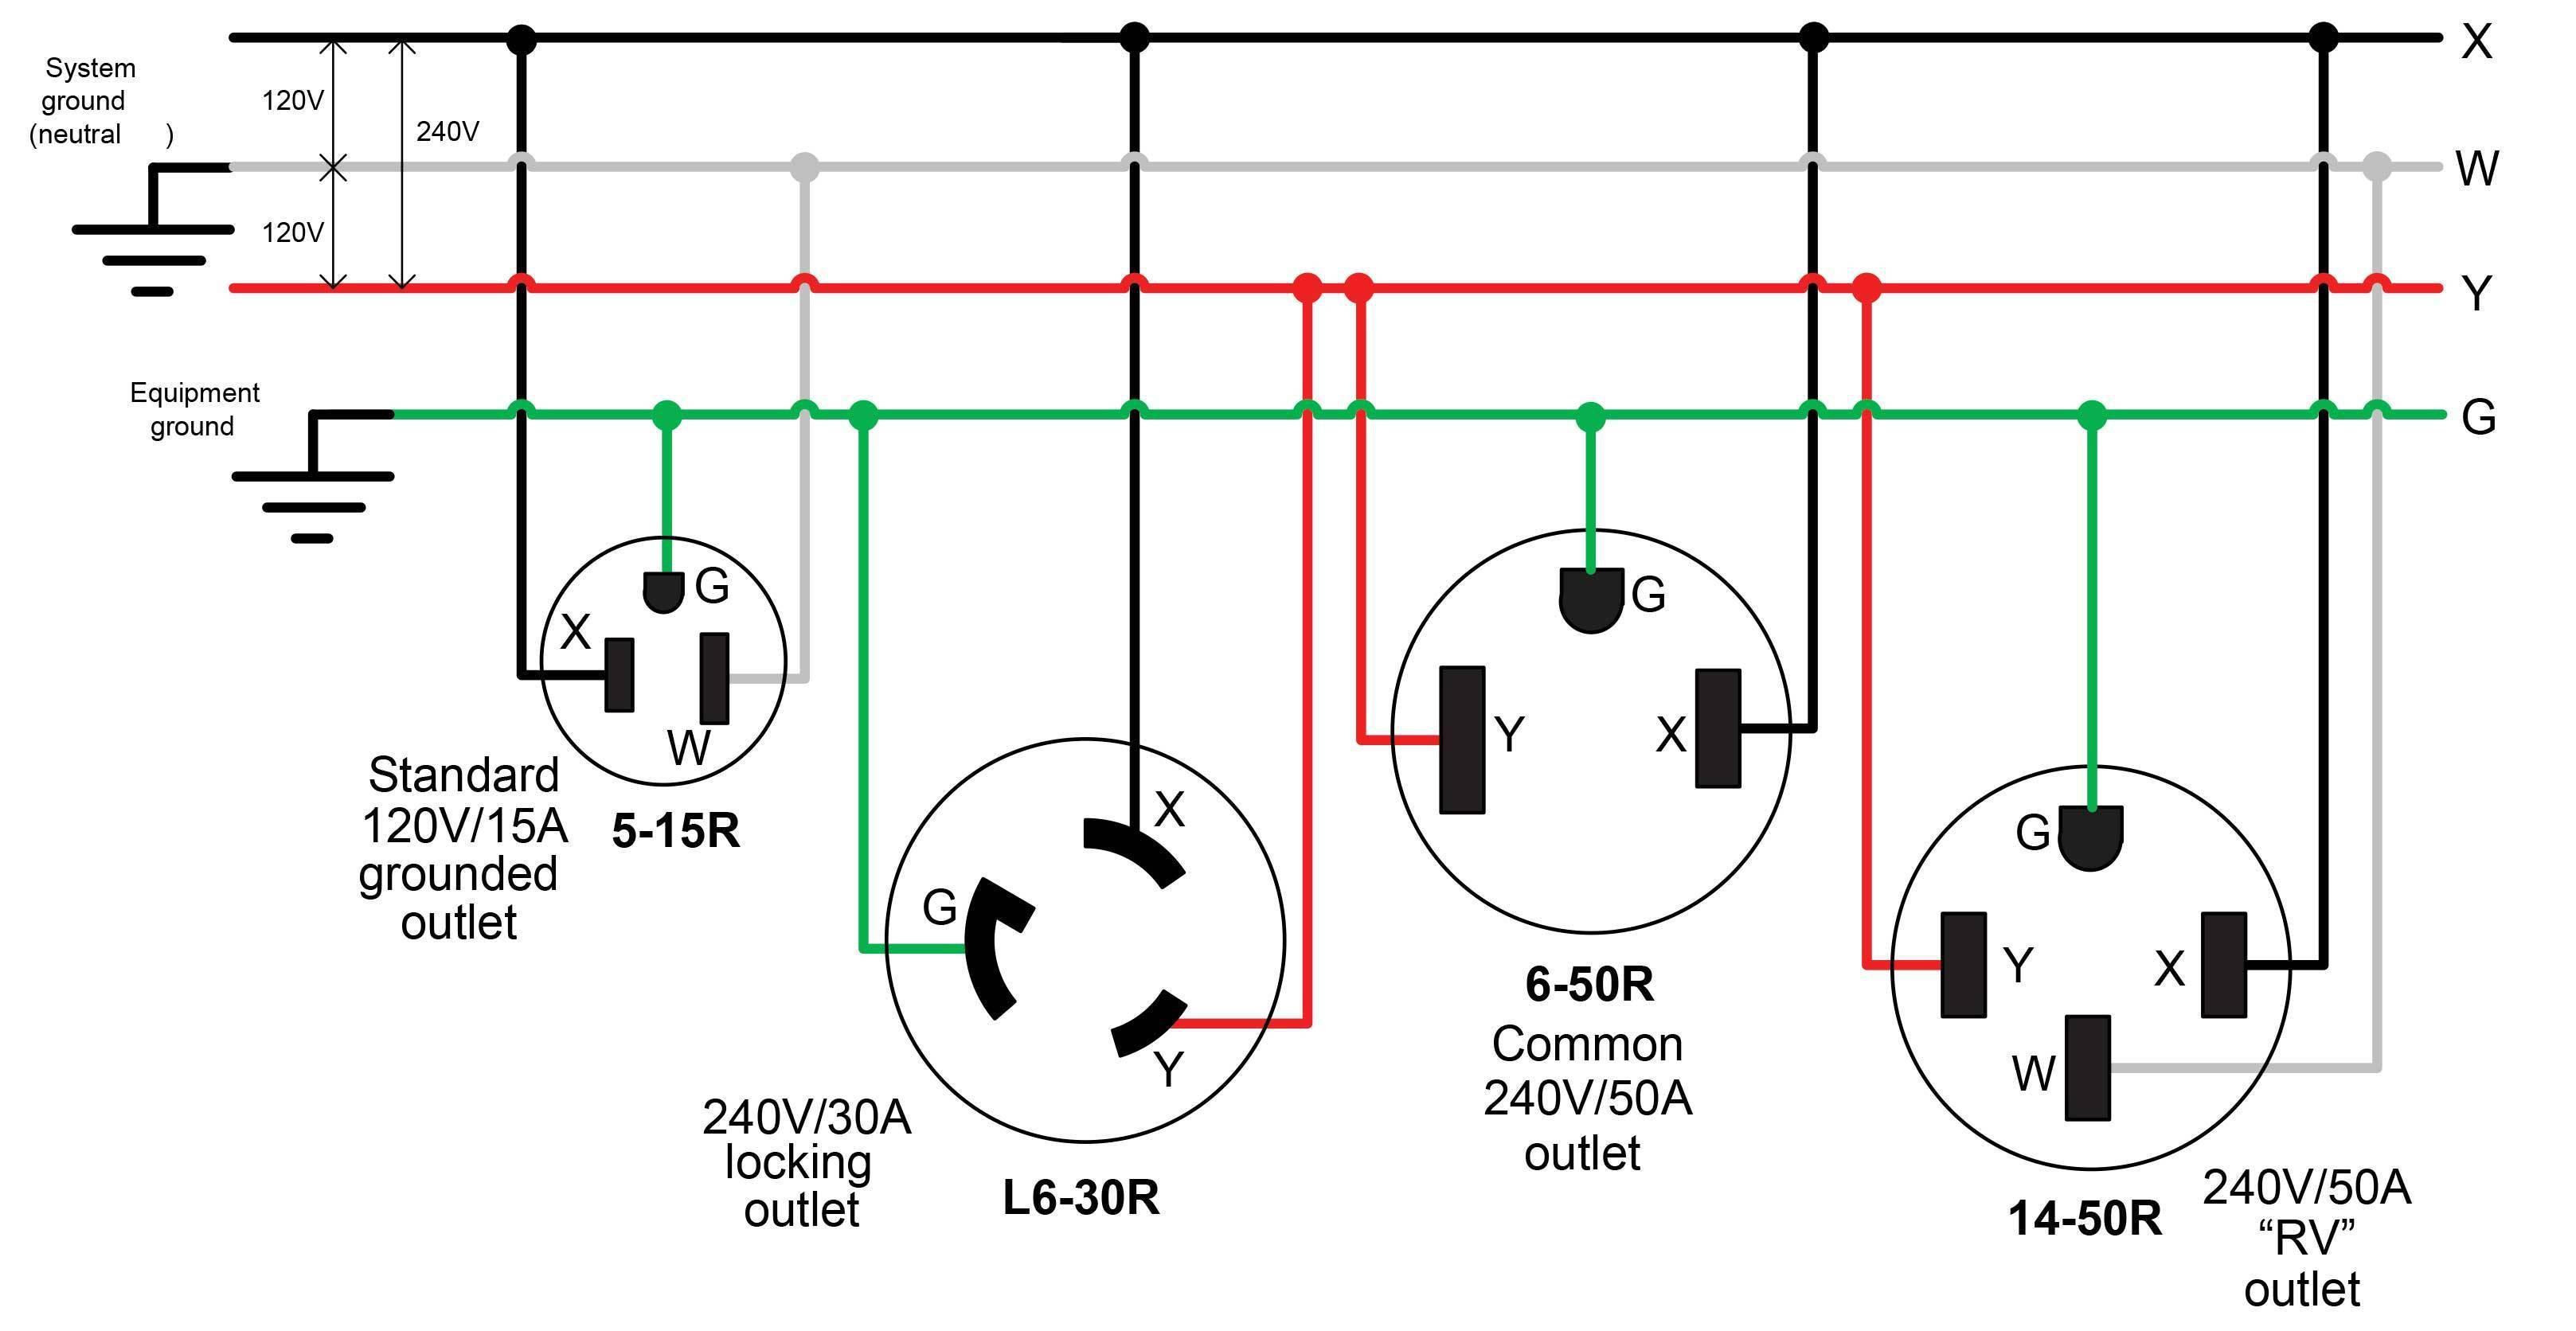 50 Amp Rv Receptacle Wiring Diagram | Wiring Diagram - 50 Amp Rv Plug Wiring Diagram